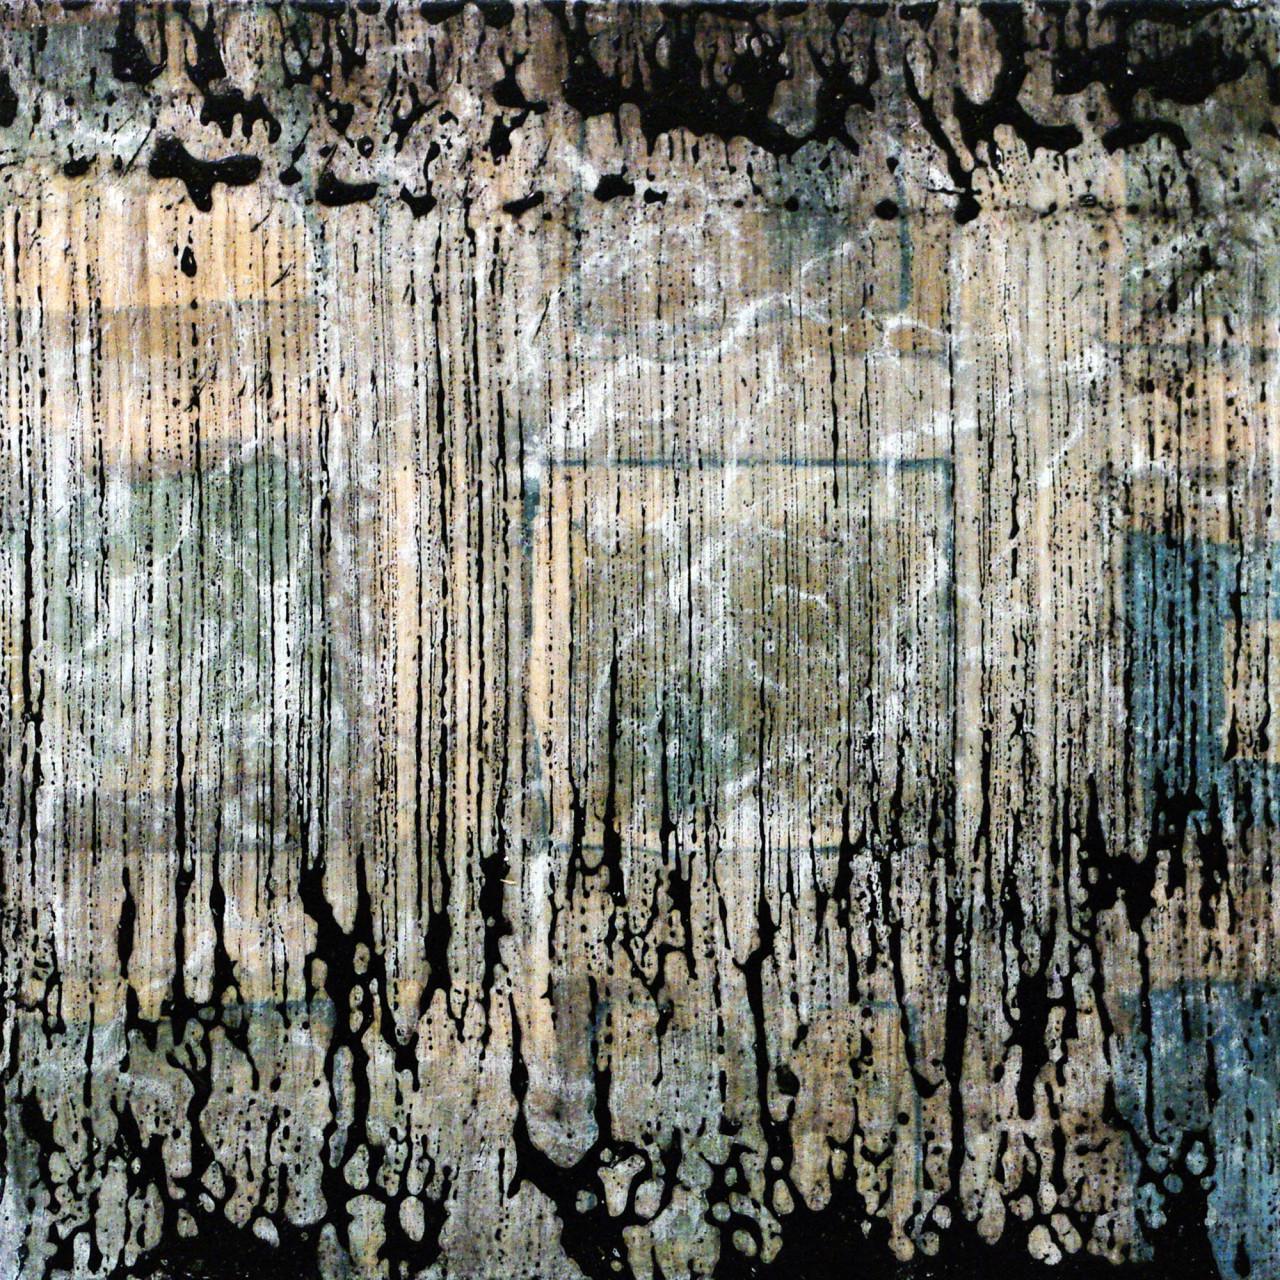 630, 2015 tecnica mista su tavola 30x30 cm